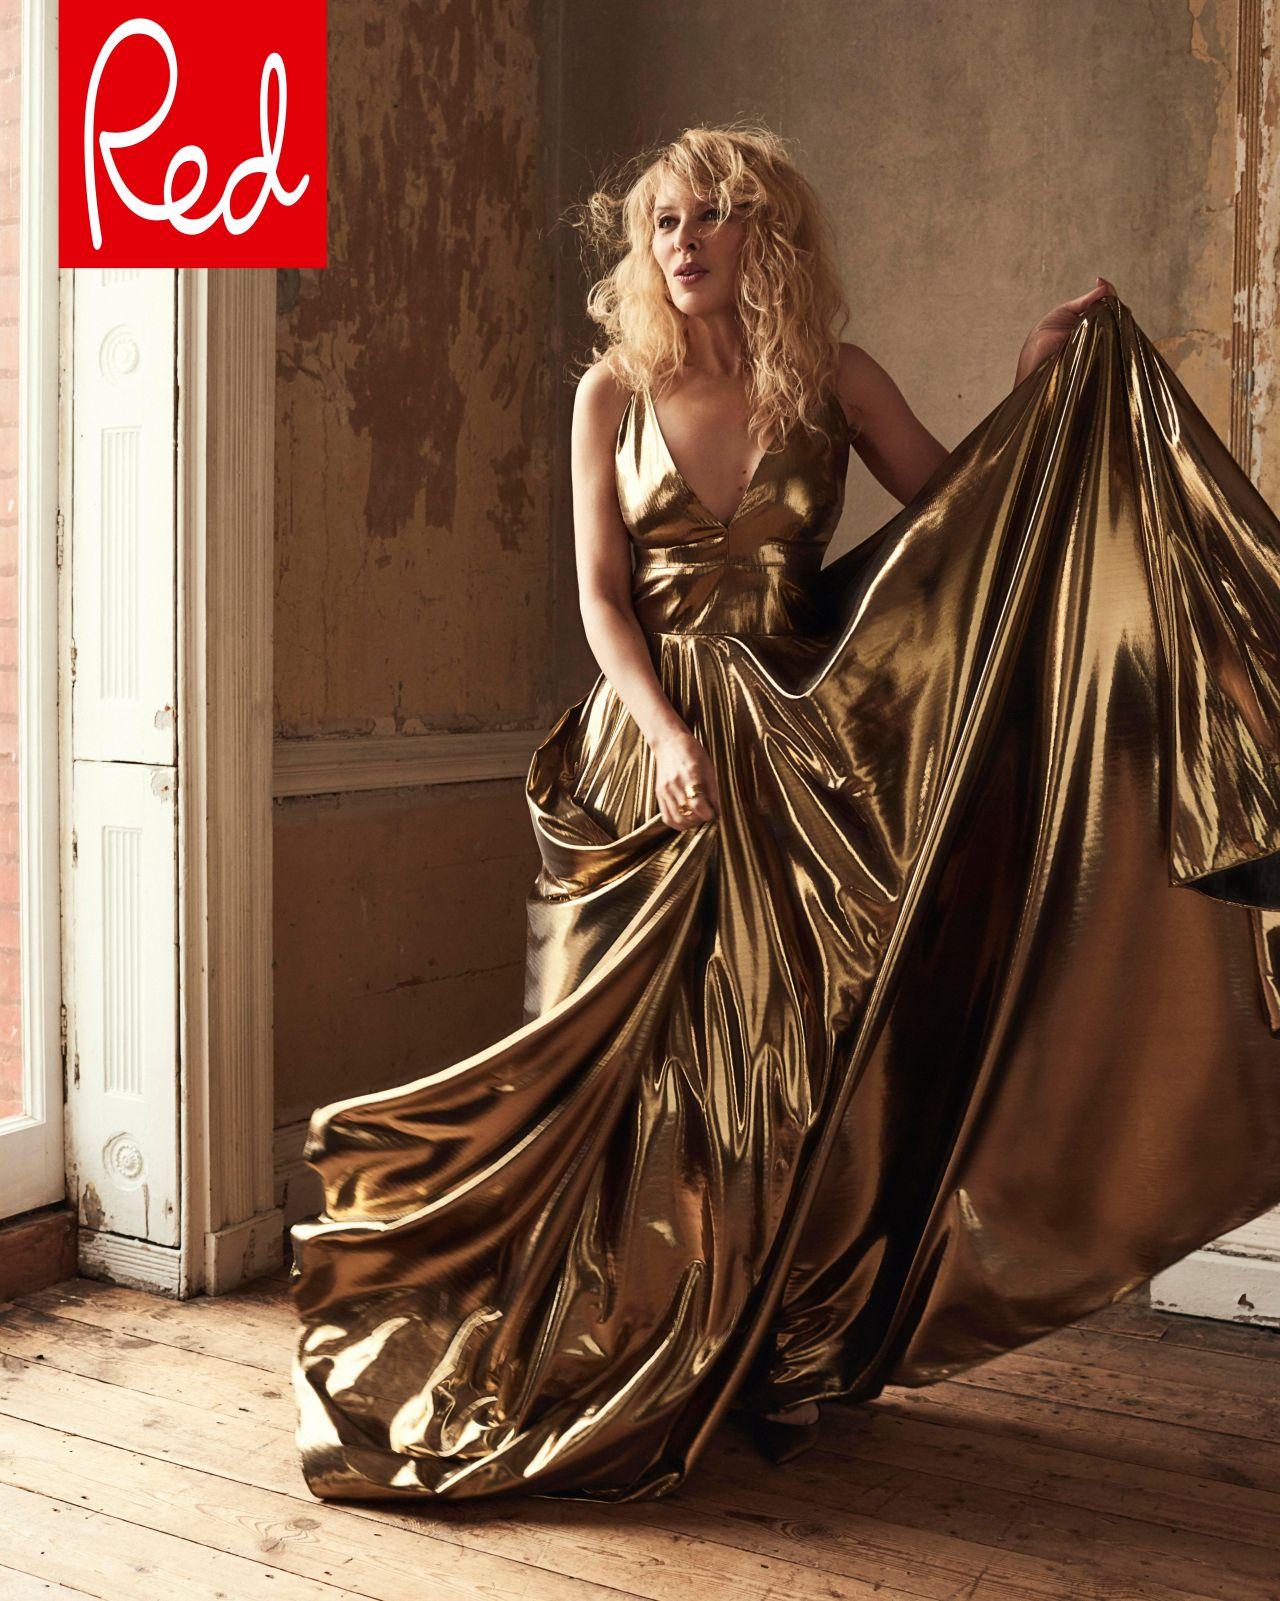 Kylie Minogue Red Magazine May 2018